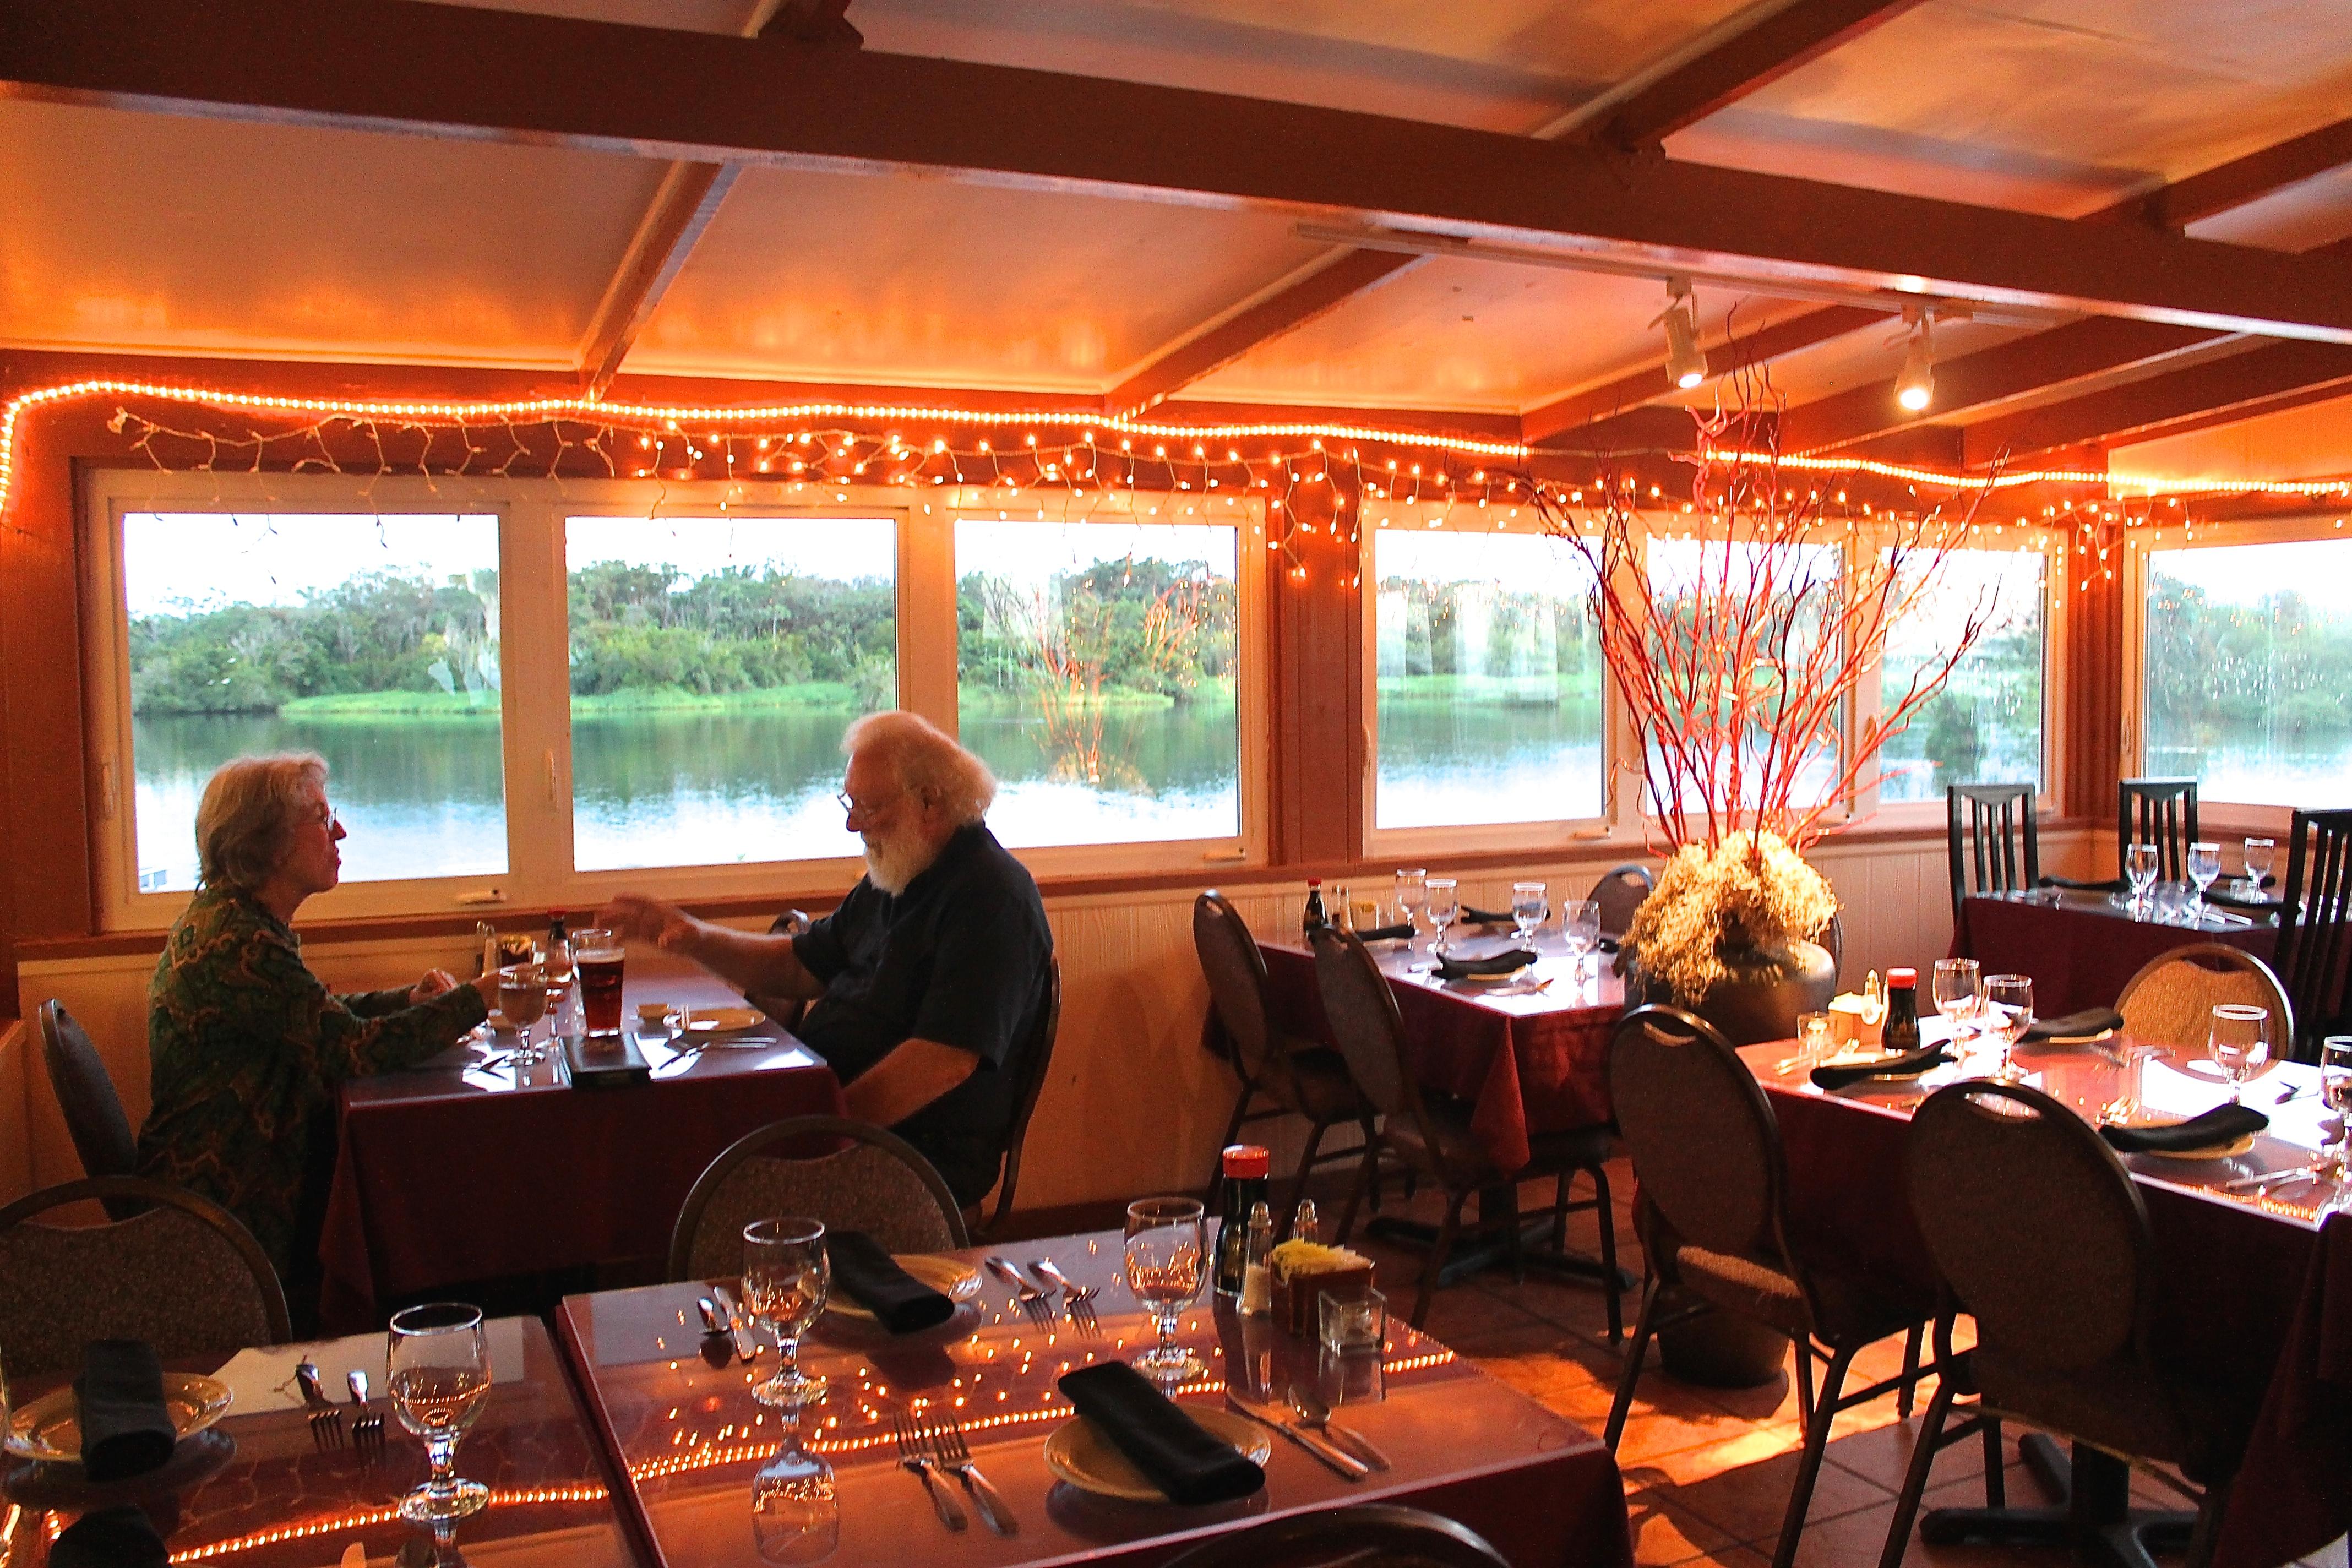 The Seaside Restaurant & Aqua Farm: Fresh Fish and More ...